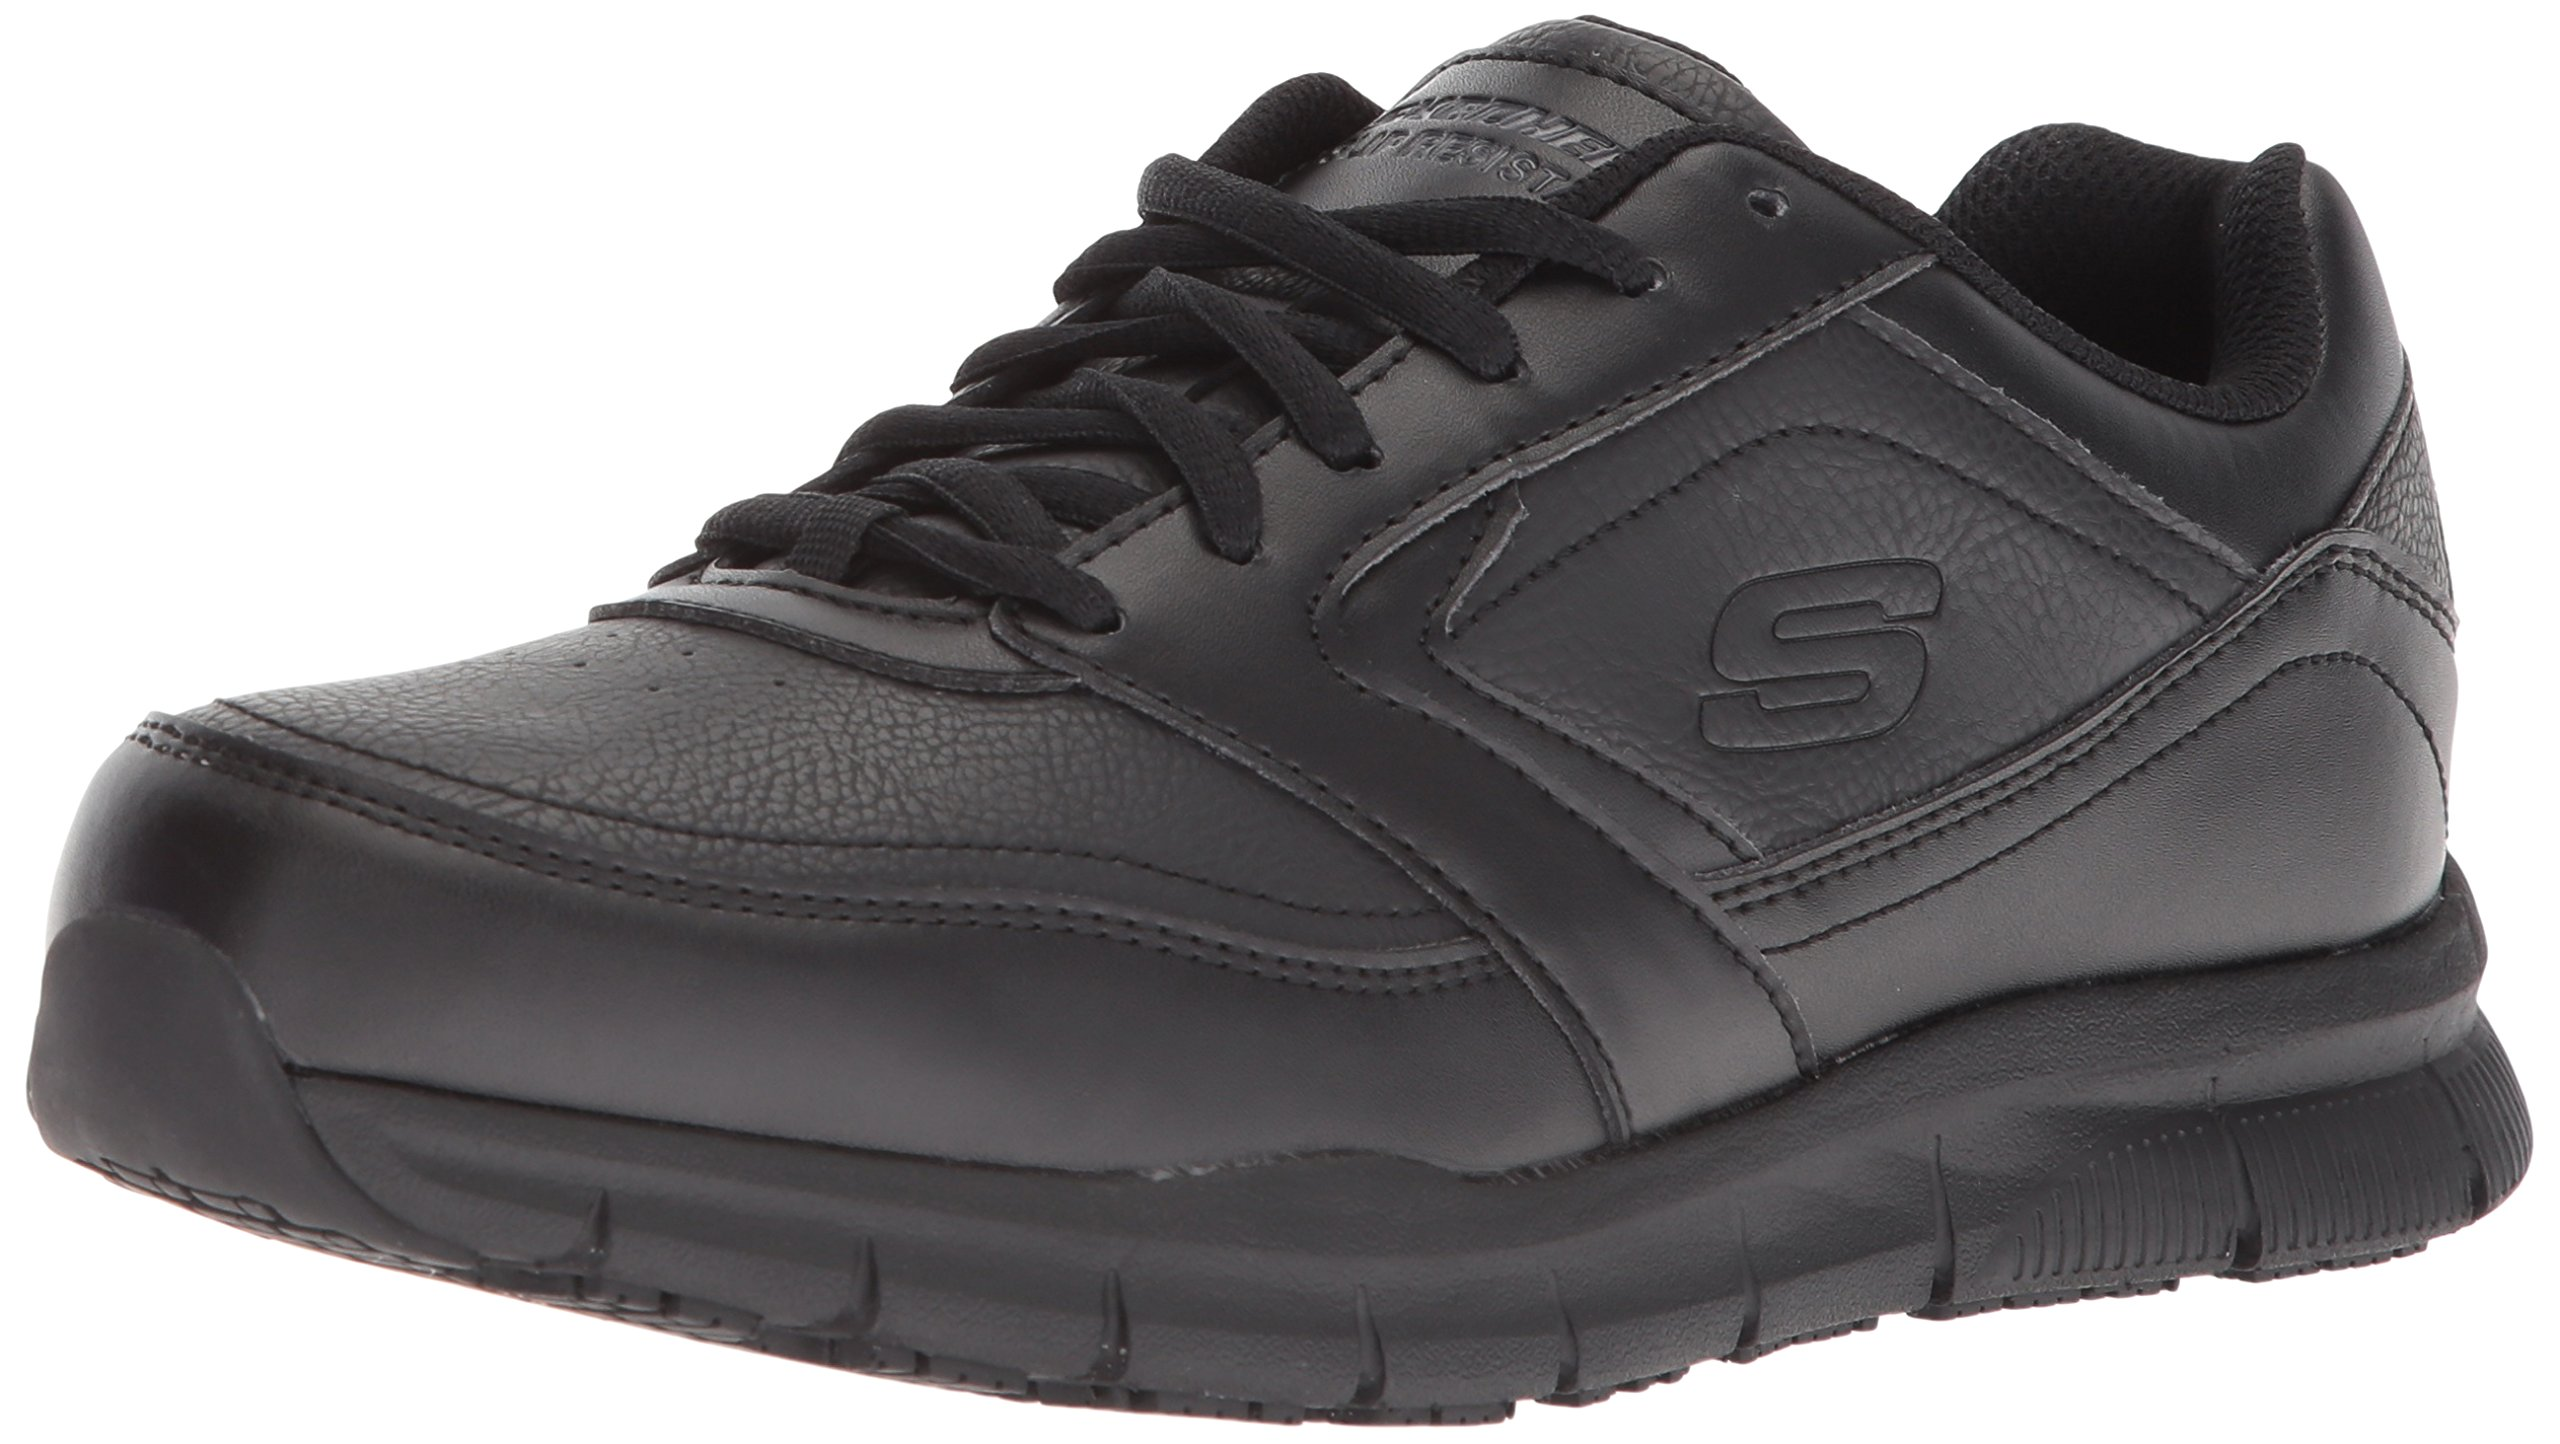 Skechers for Work Women's Nampa-Wyola Food Service Shoe, black polyurethane, 8.5 M US by Skechers